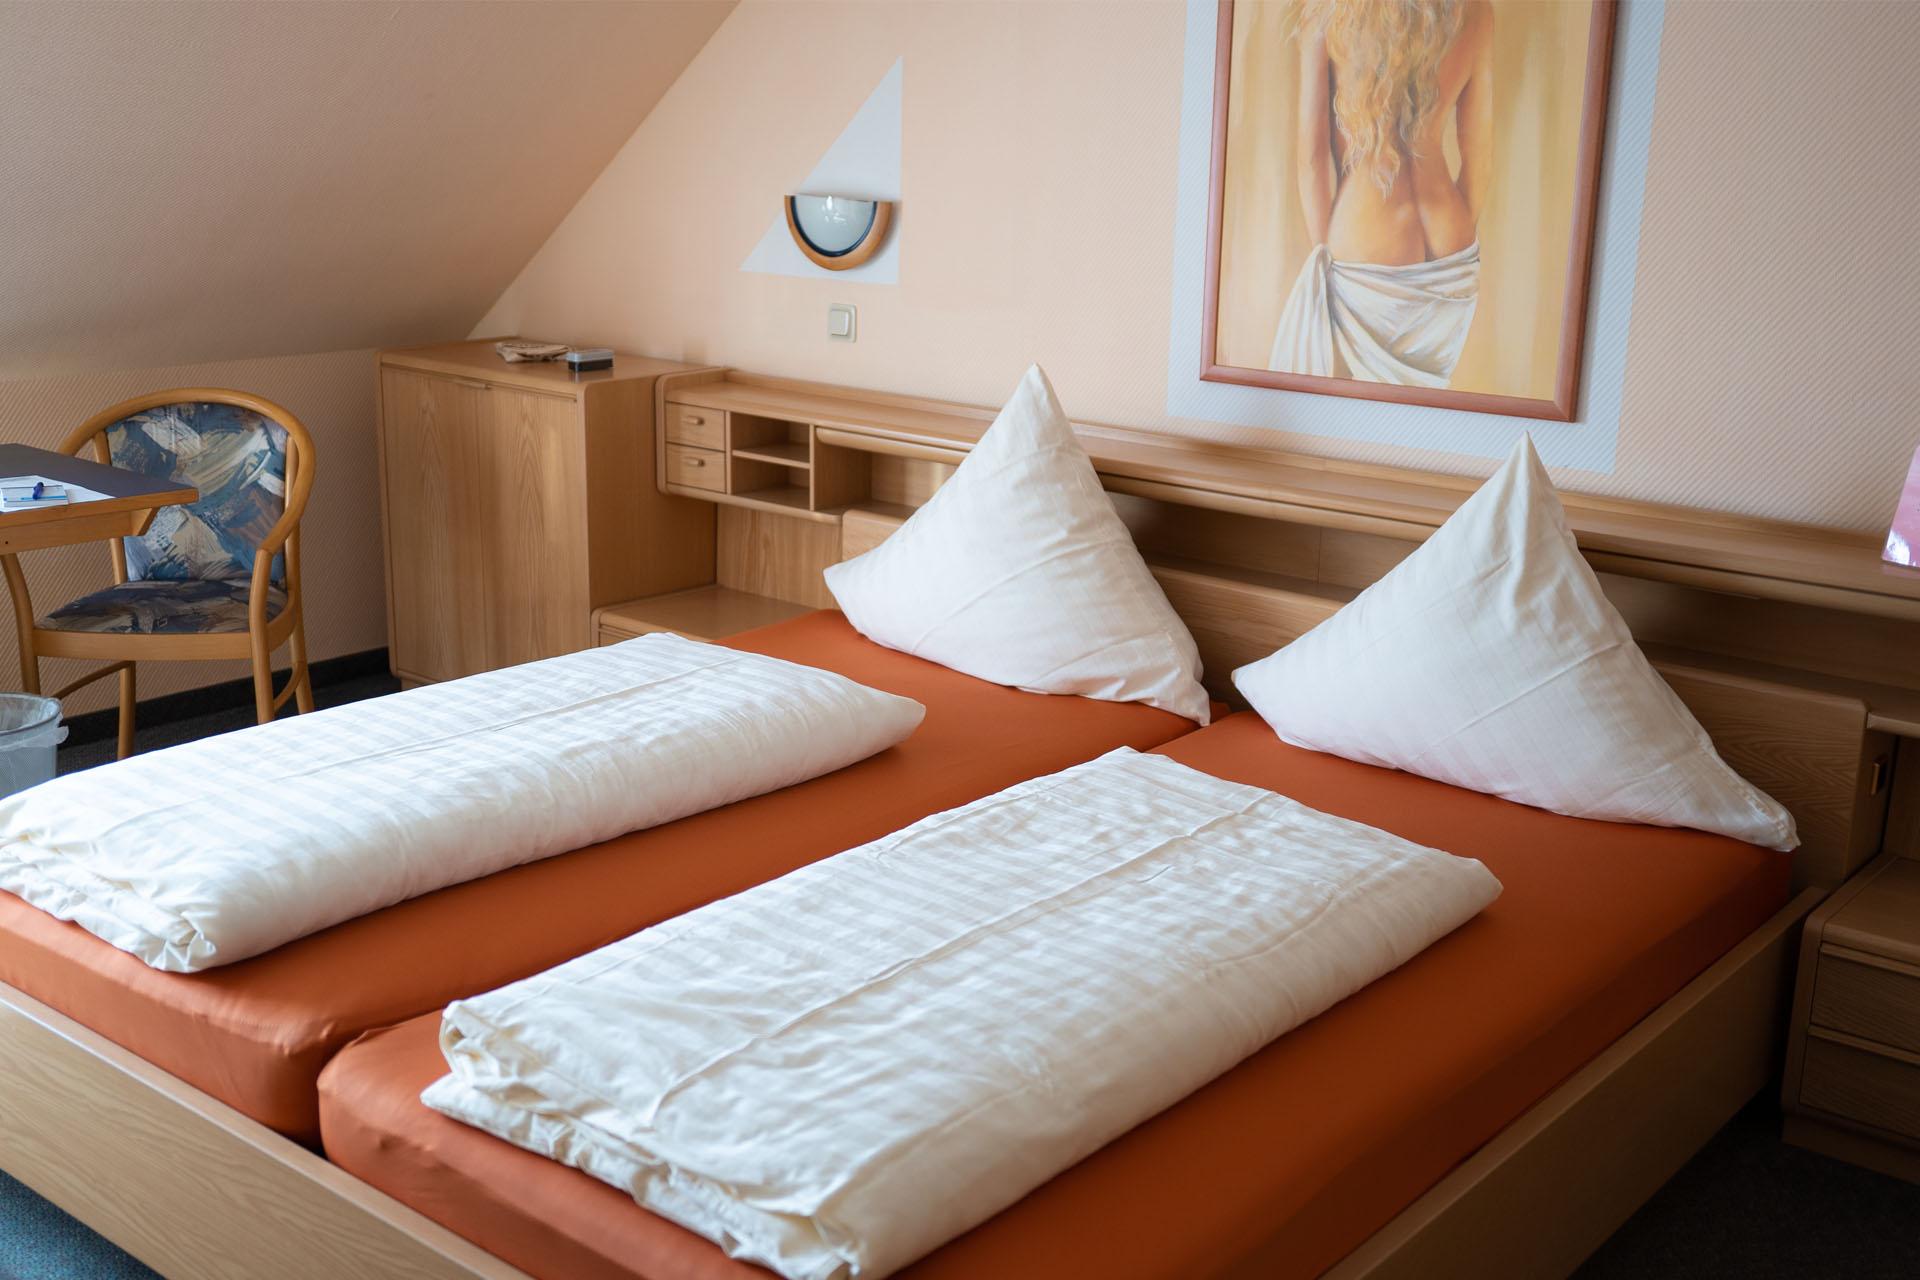 Hotel_Aggertal_Zimmer_Doppelzimmer04